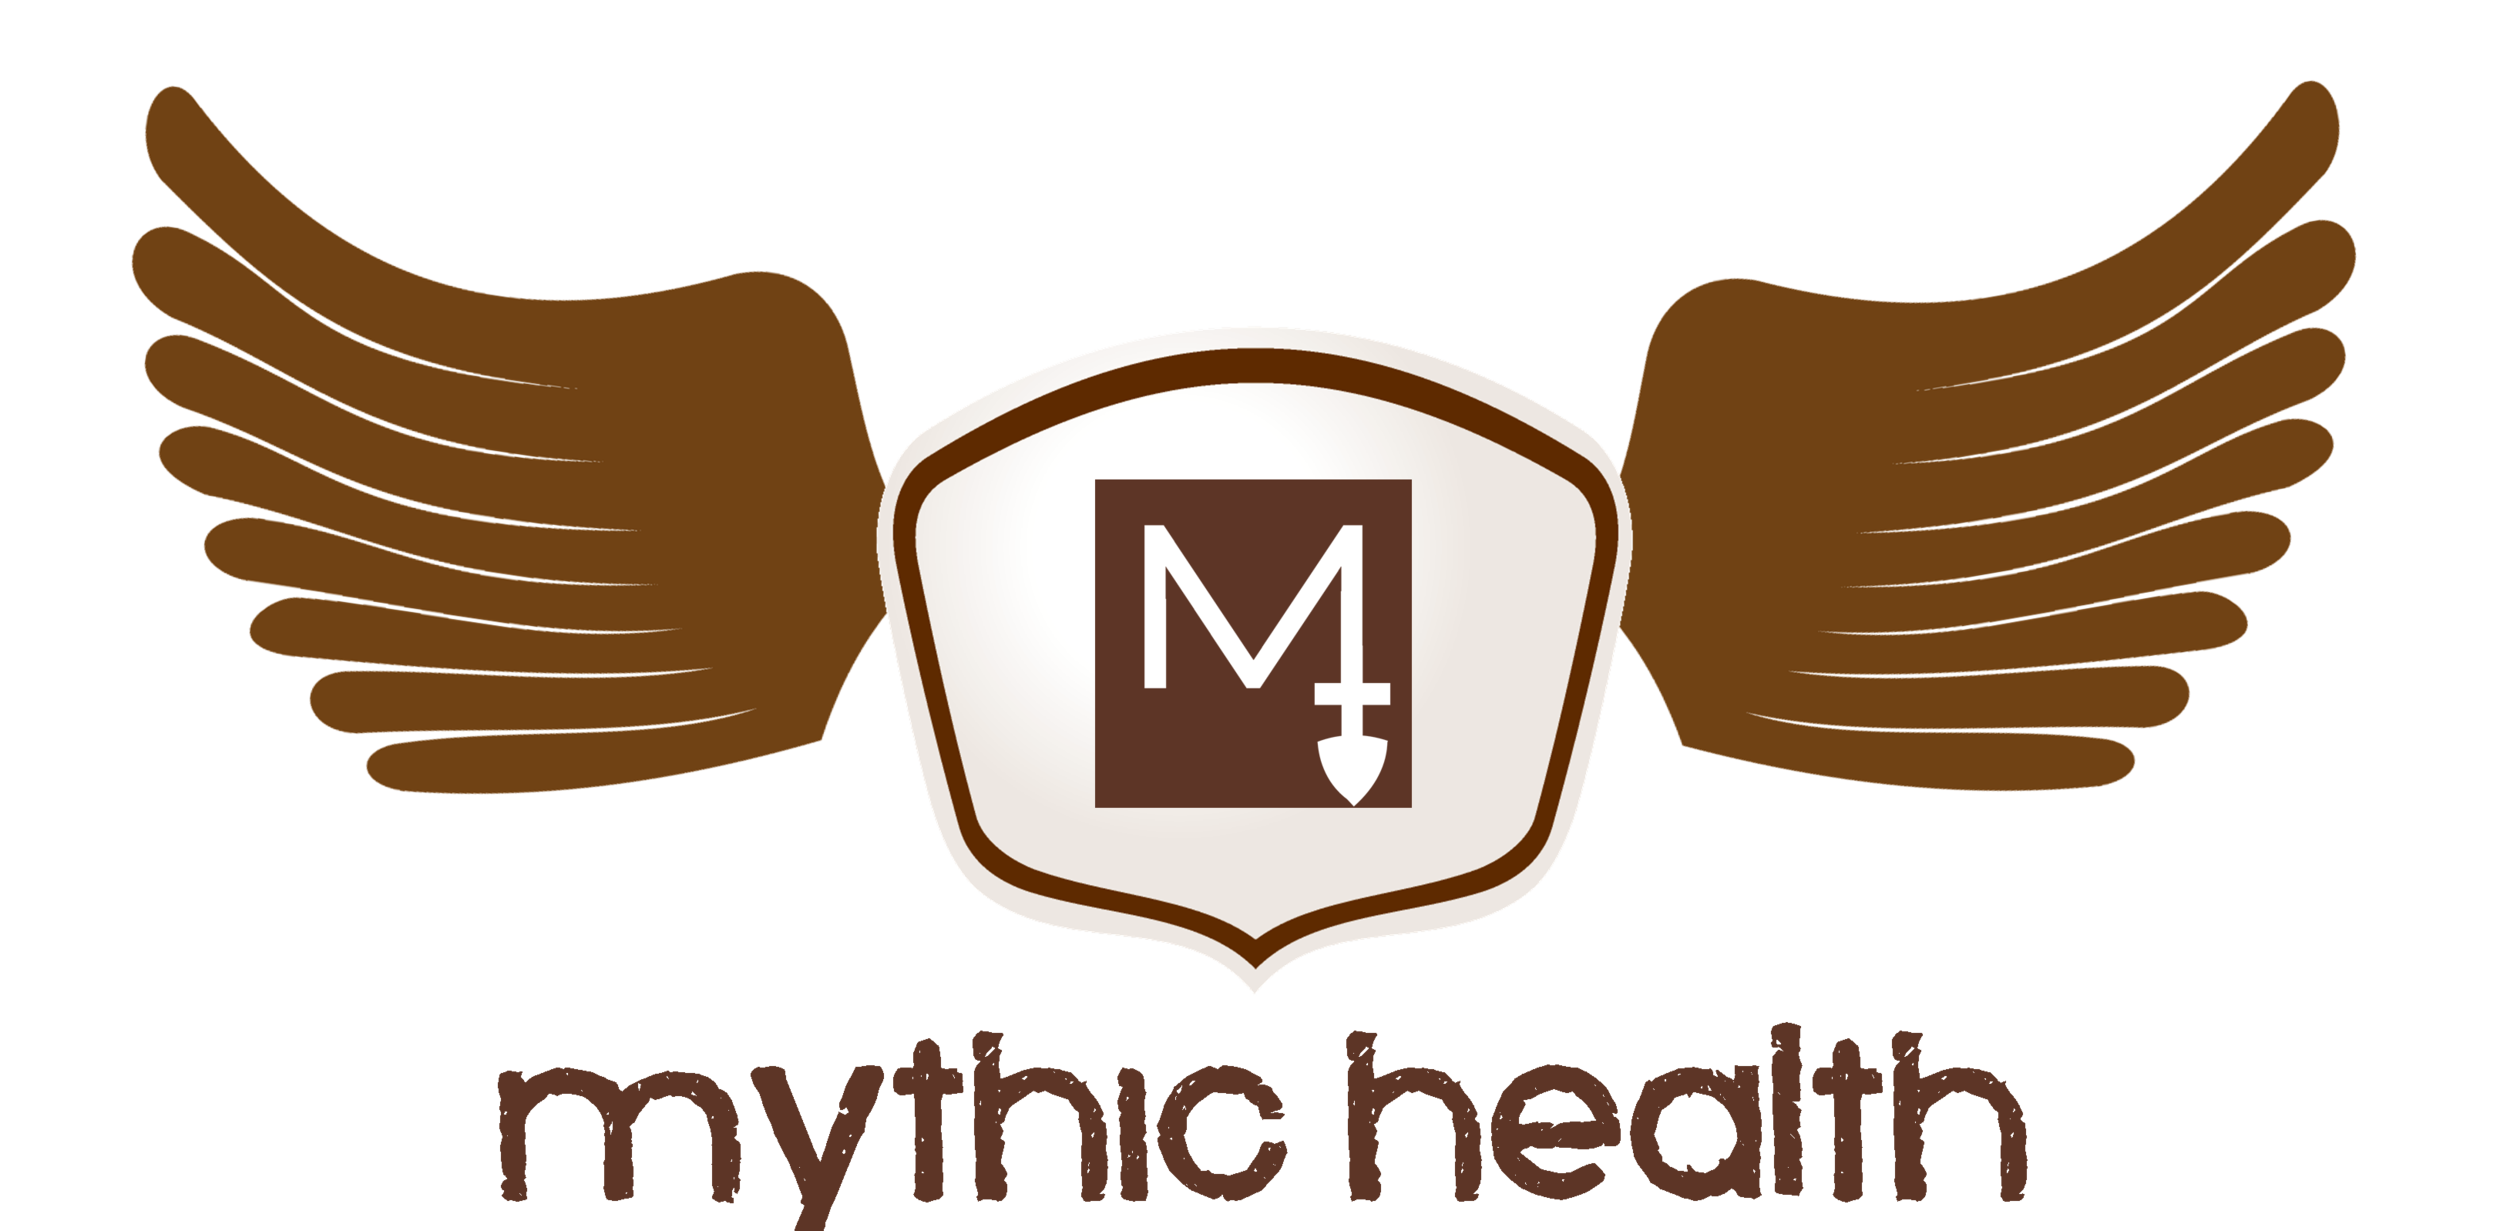 mythic health essential oils medical devices lymphedema compression garments